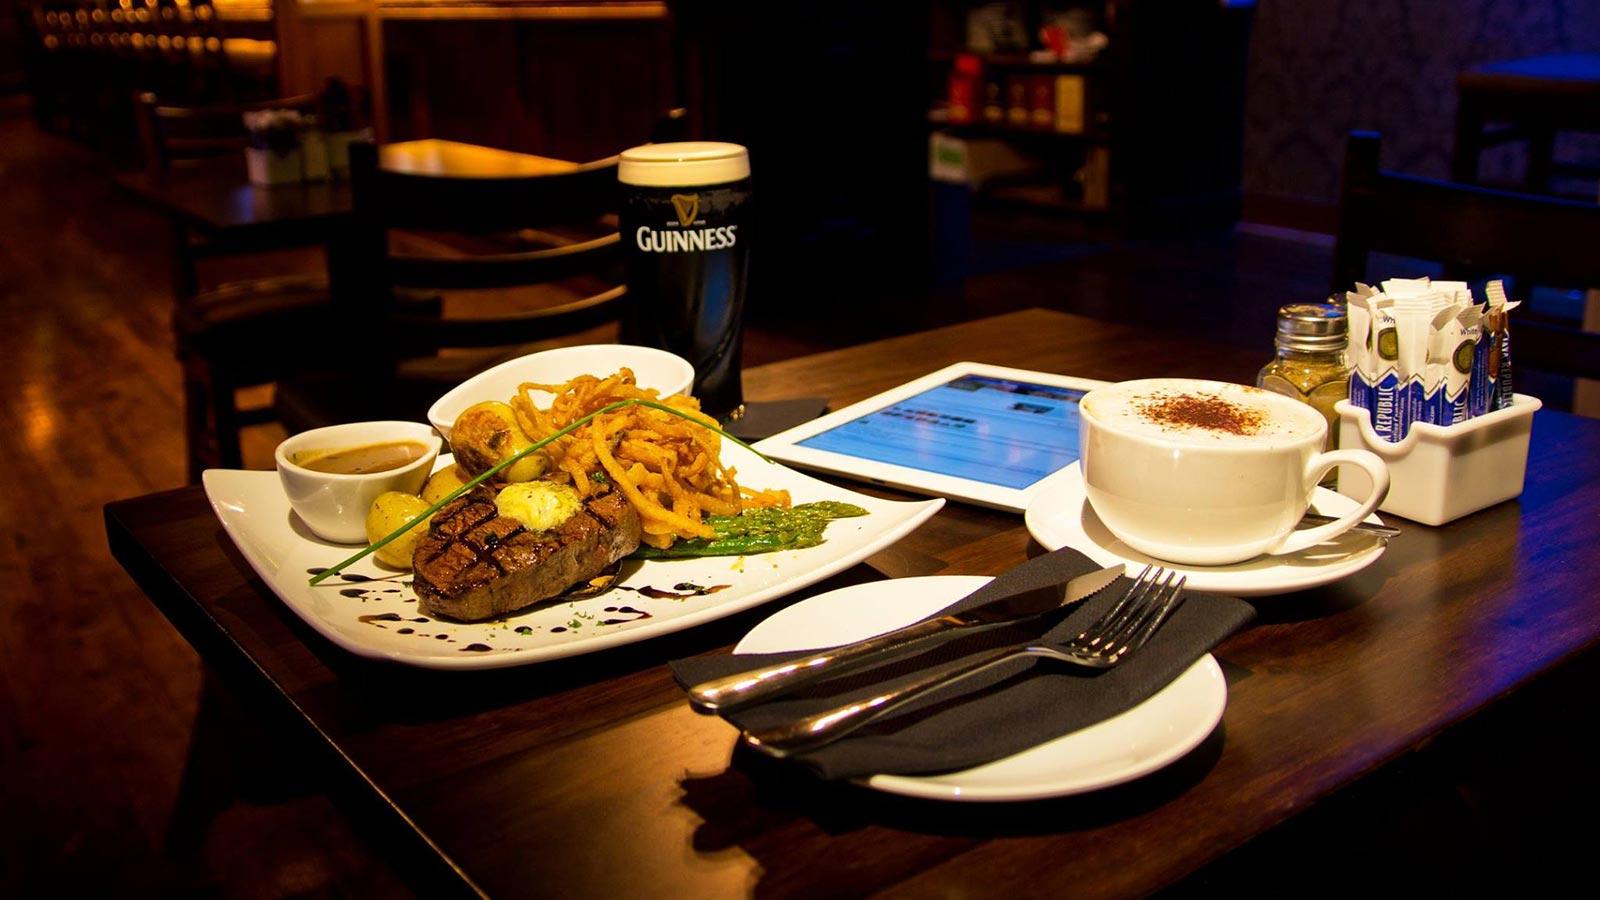 Best Food Pub in Ireland